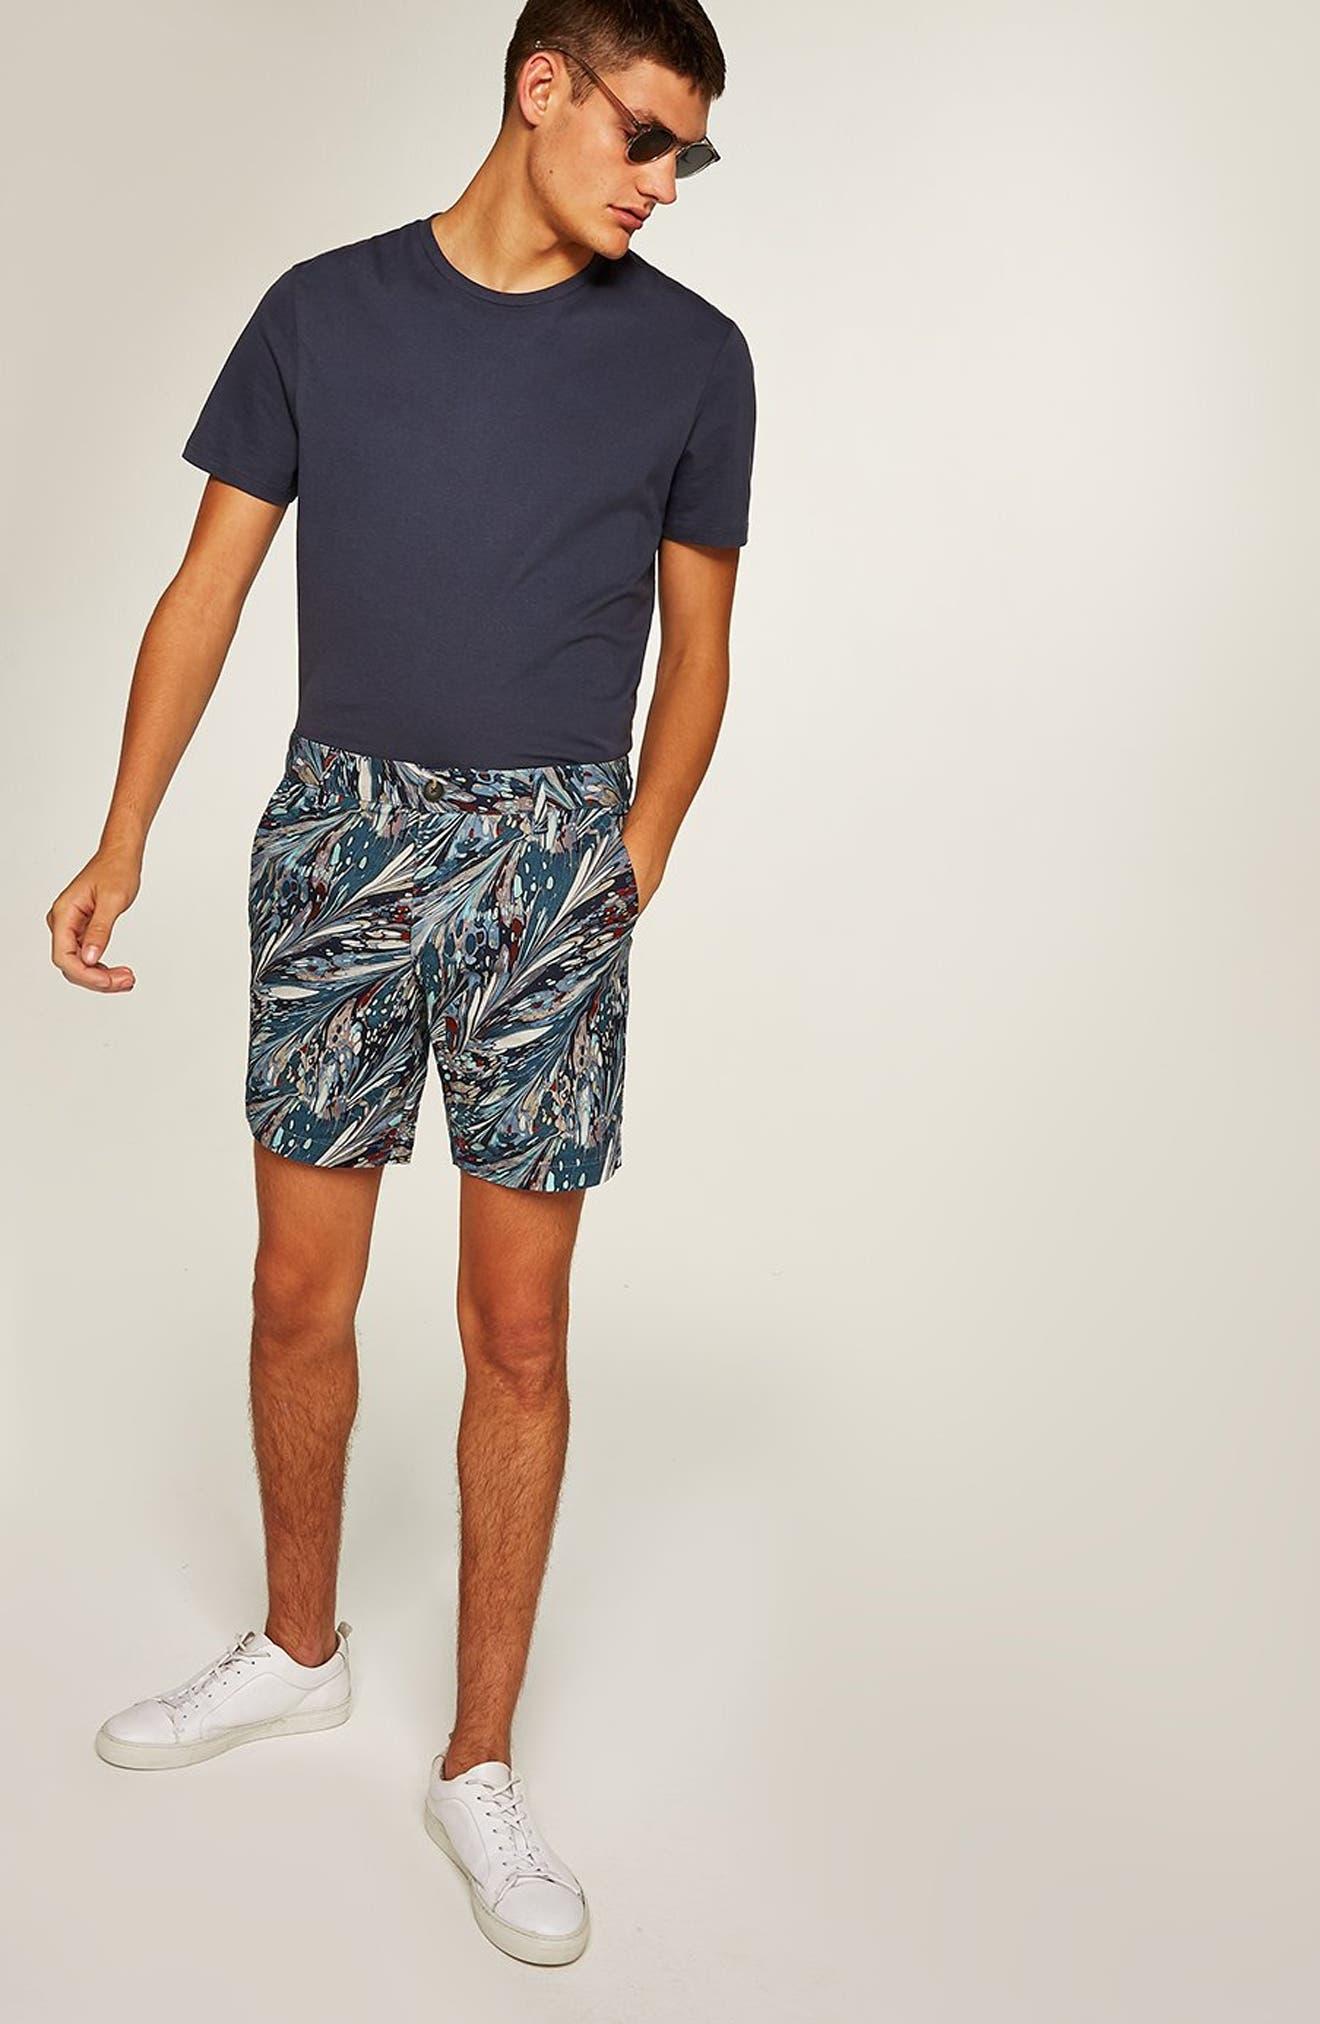 Marble Print Shorts,                             Alternate thumbnail 3, color,                             BLUE